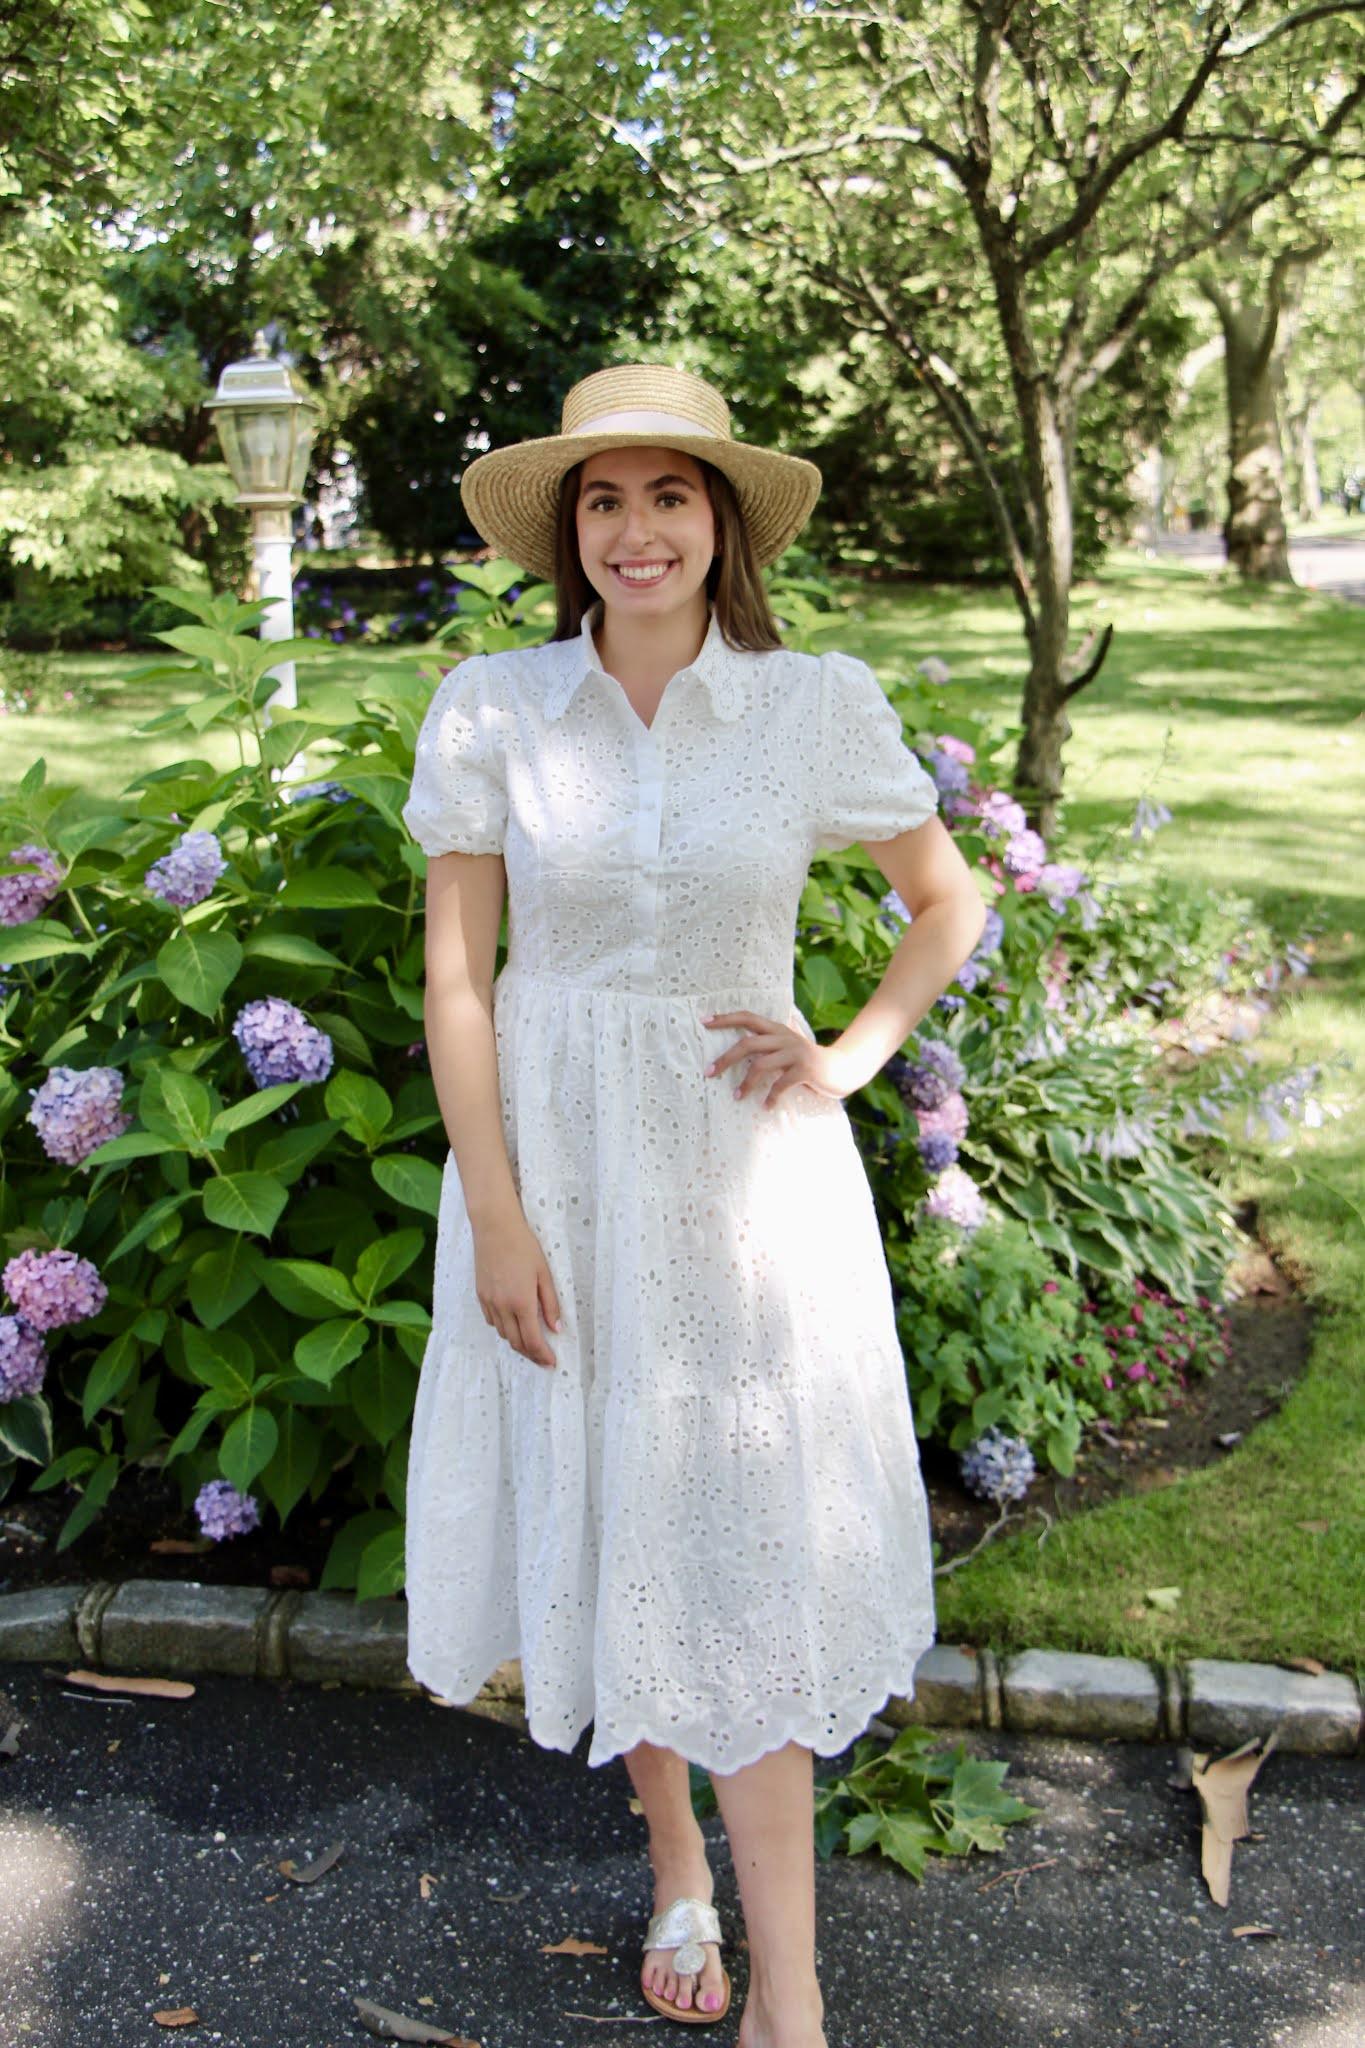 maxi dress, summer dress, straw hat, lace dress, long island, summer, chicwish